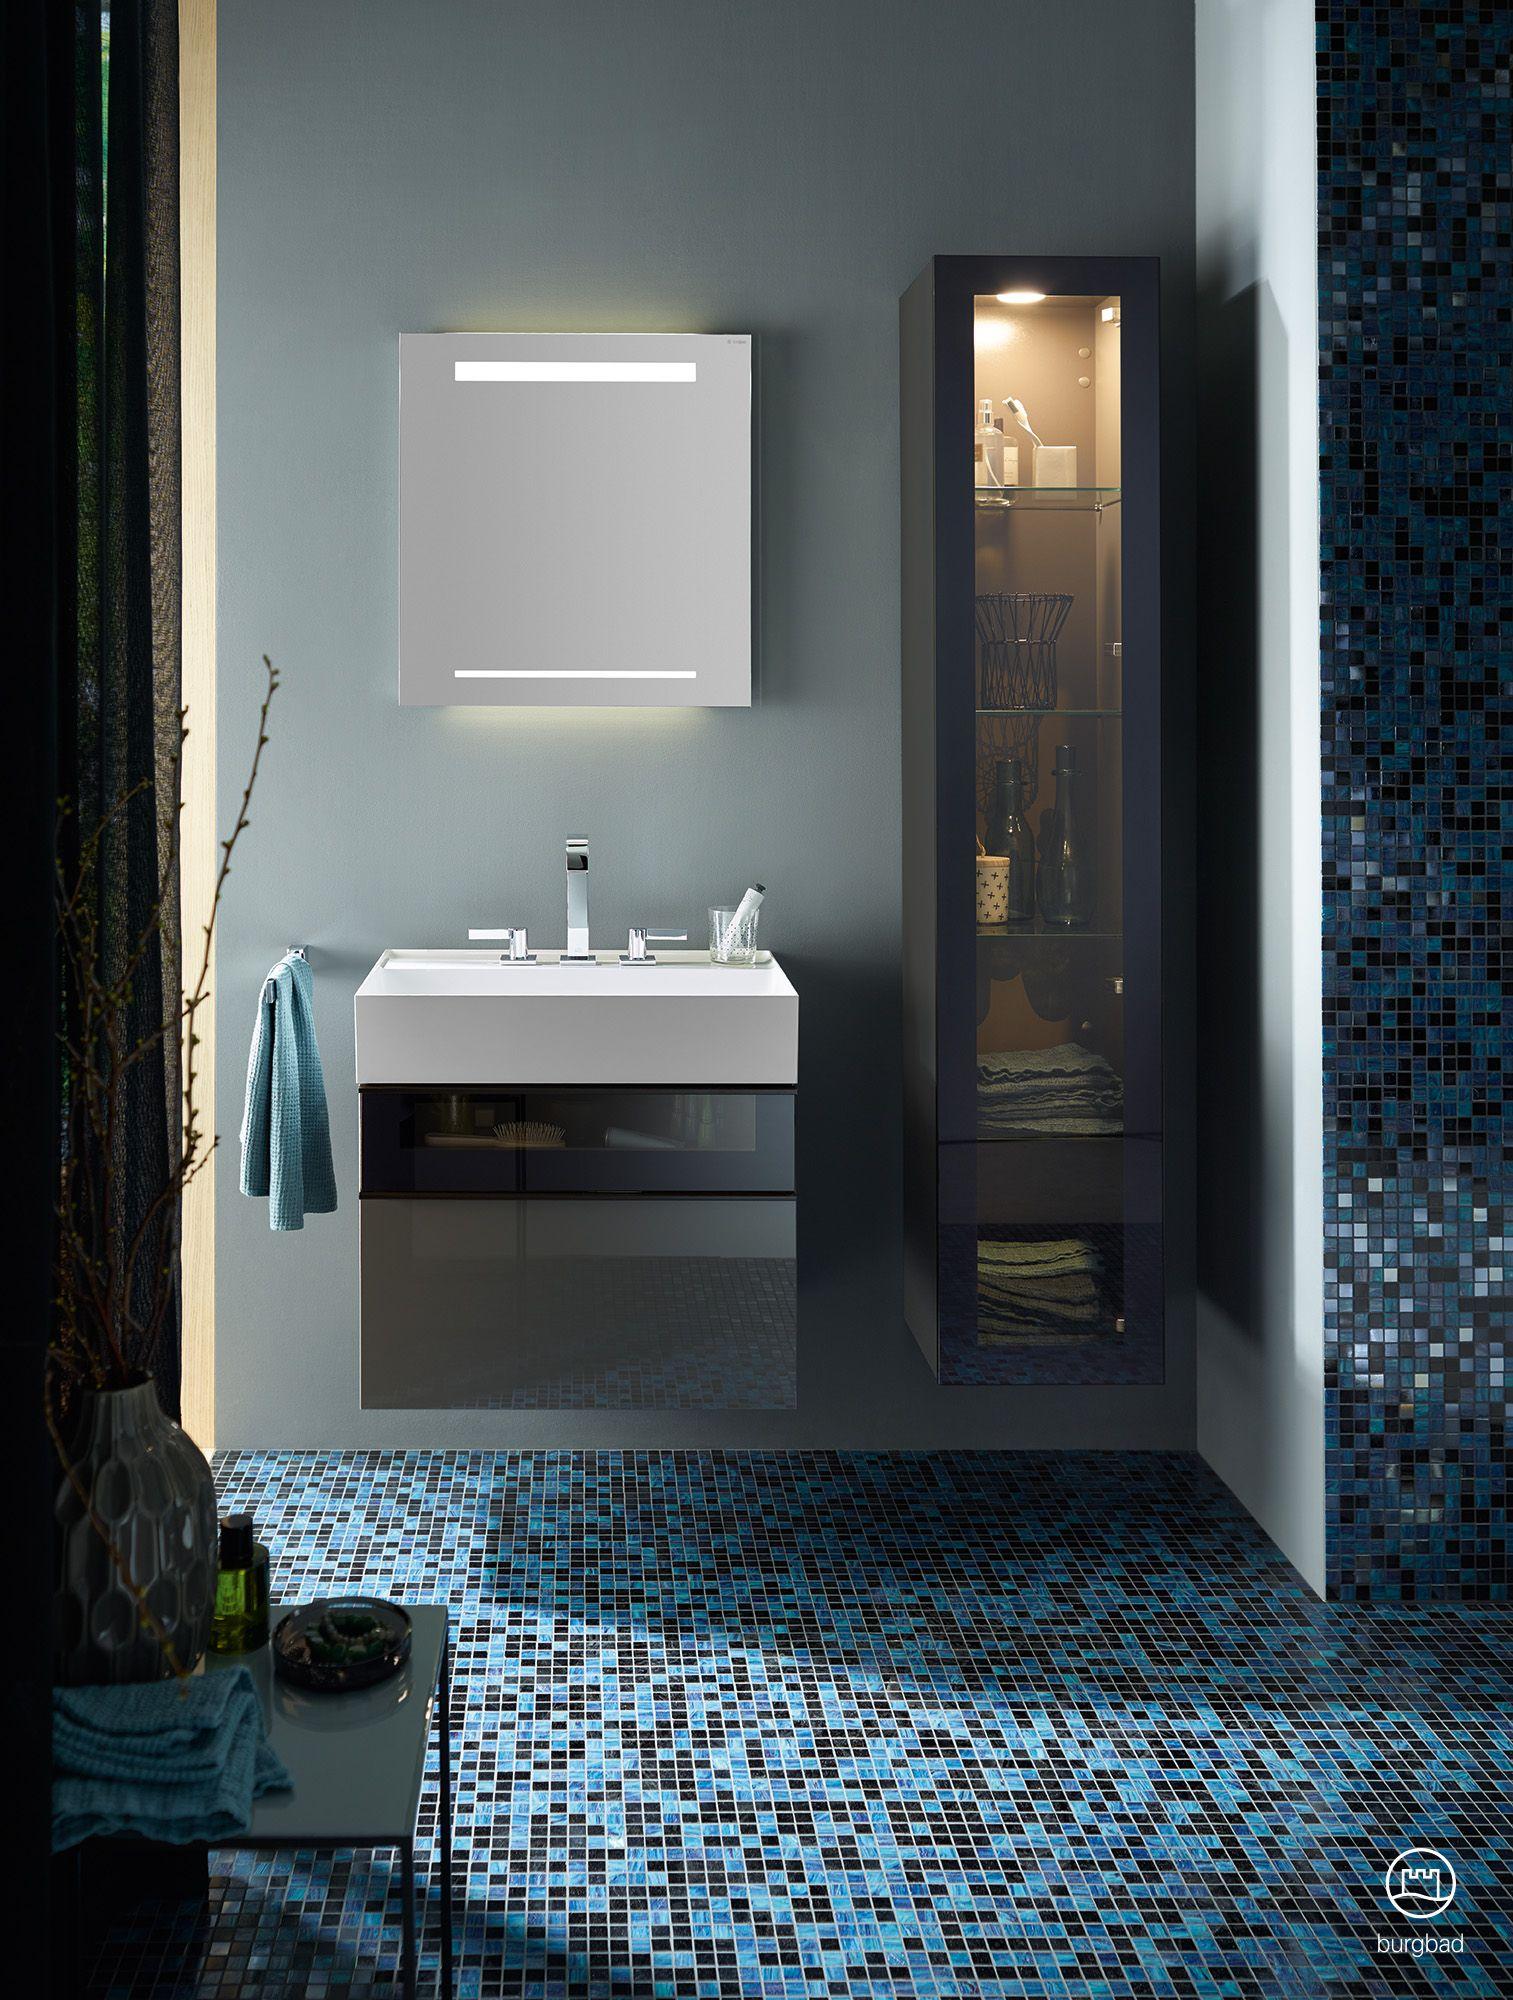 Burgbad Yumo Small Bathroom With Furniture In Grey High Gloss